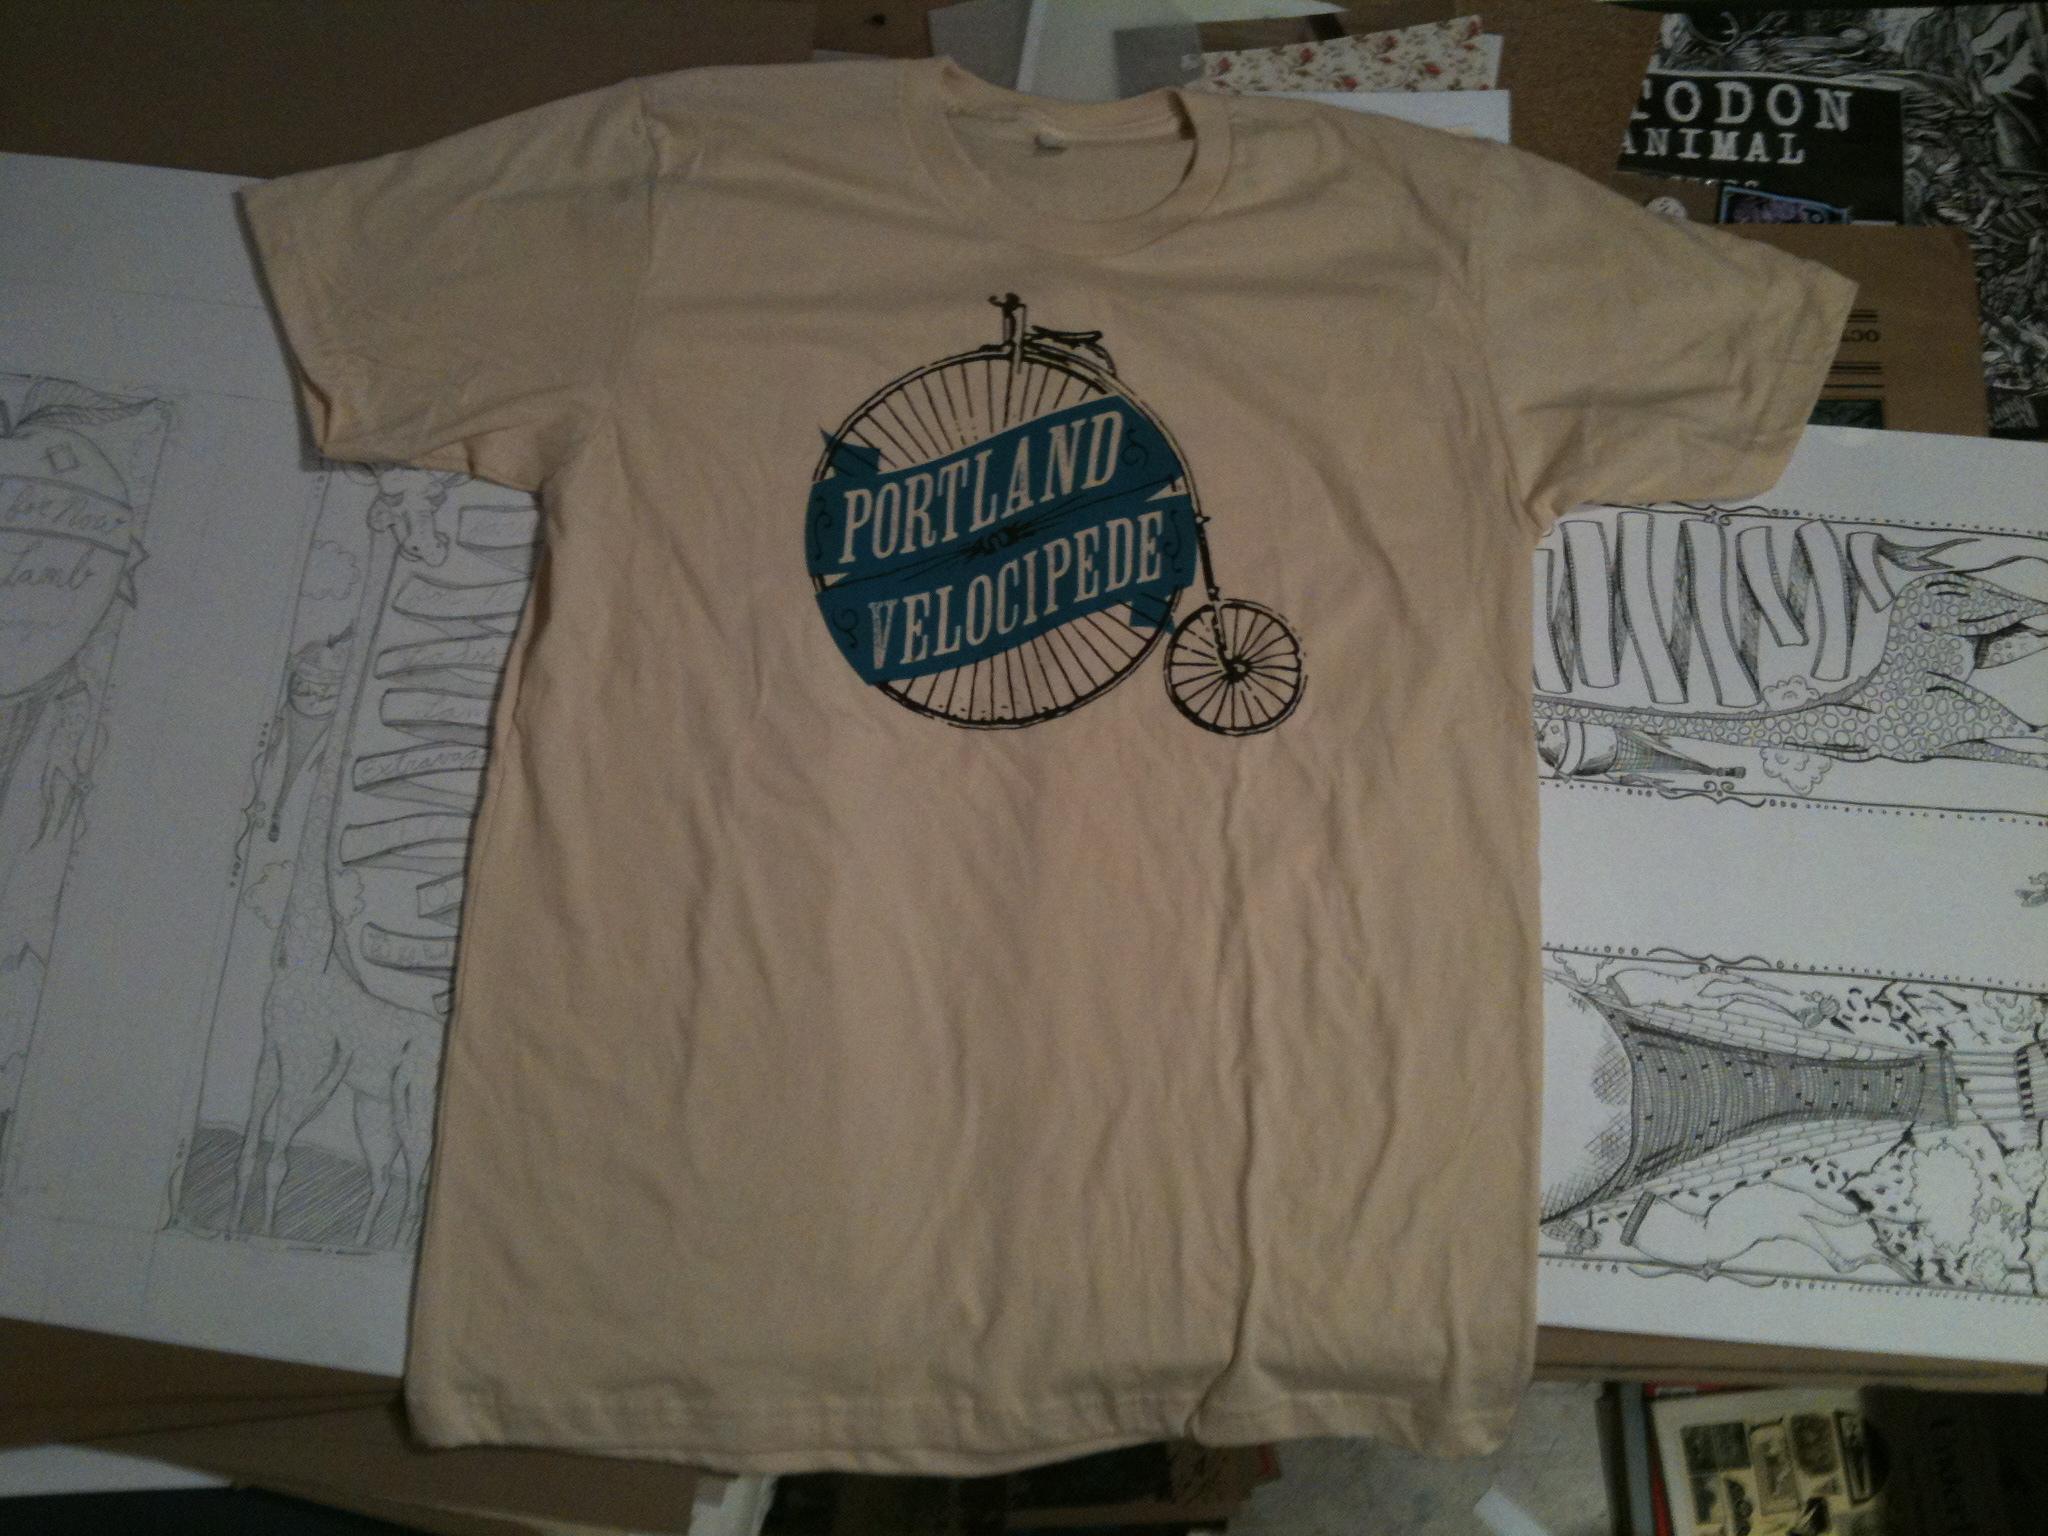 Portland velocipede t shirts kris johnsen art blog for T shirt printing in portland oregon